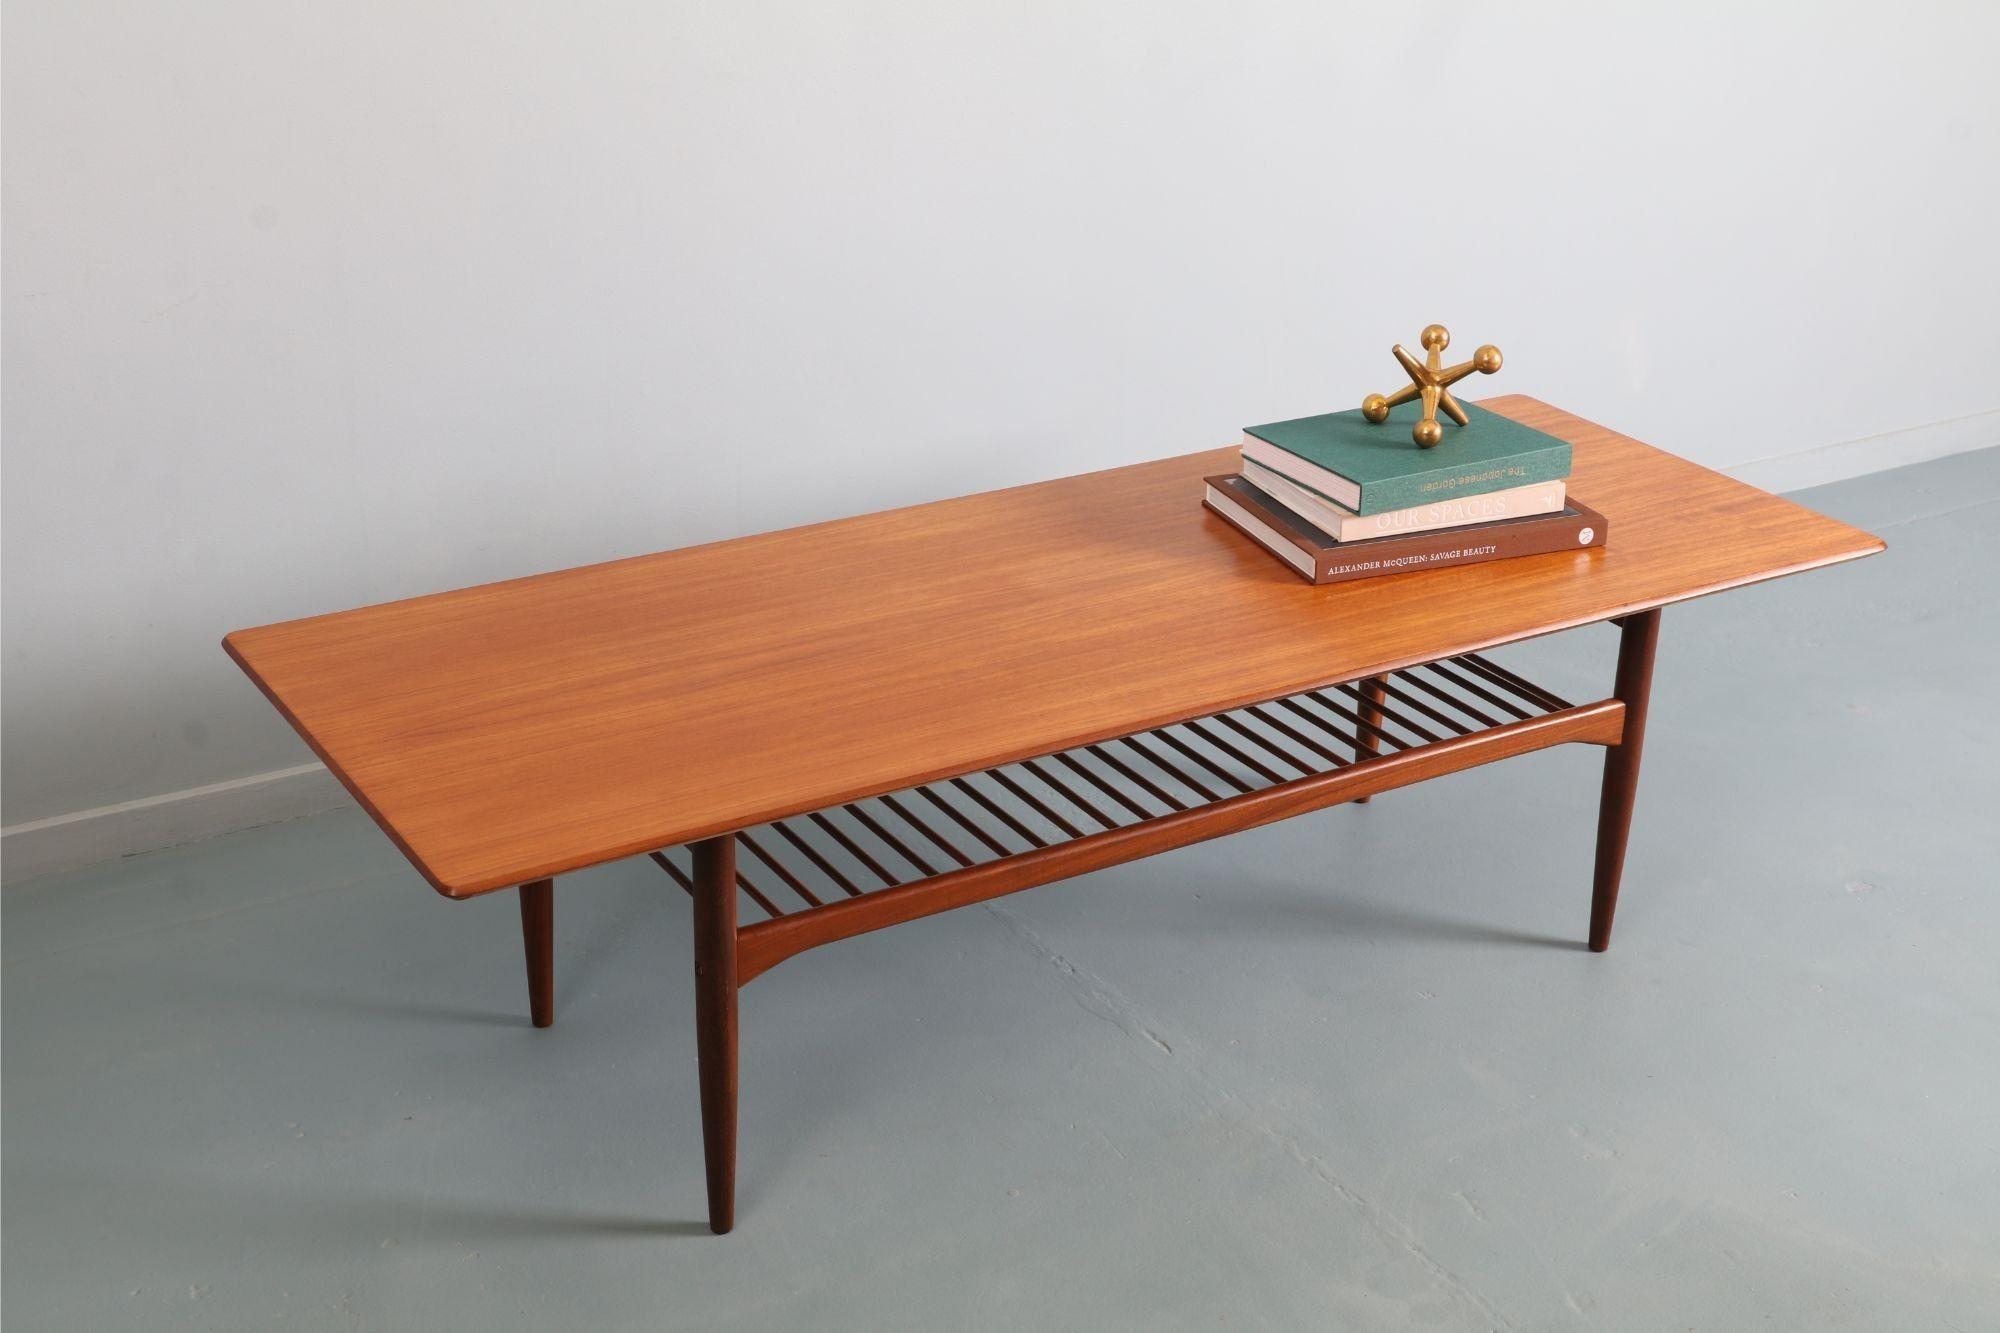 Mr Bigglesworthy Mid Century Modern And Designer Retro Furniture Retro Furniture Furniture Mid Century Modern [ 1333 x 2000 Pixel ]